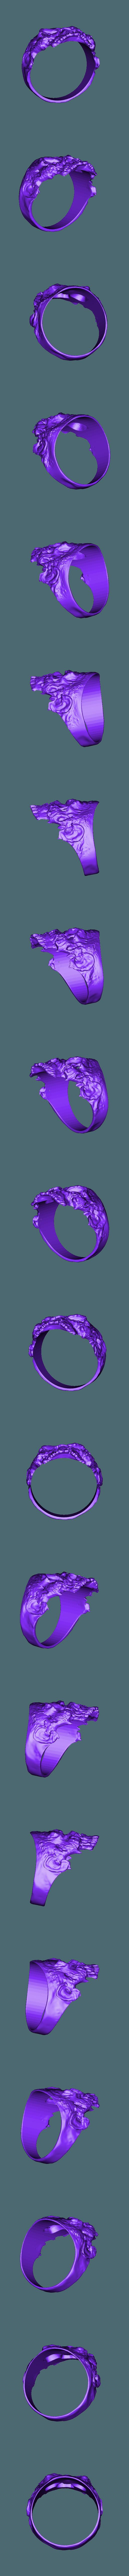 zombie  ring 19mm .stl Download free STL file Zombie Skull Ring • 3D printer model, LittleTup